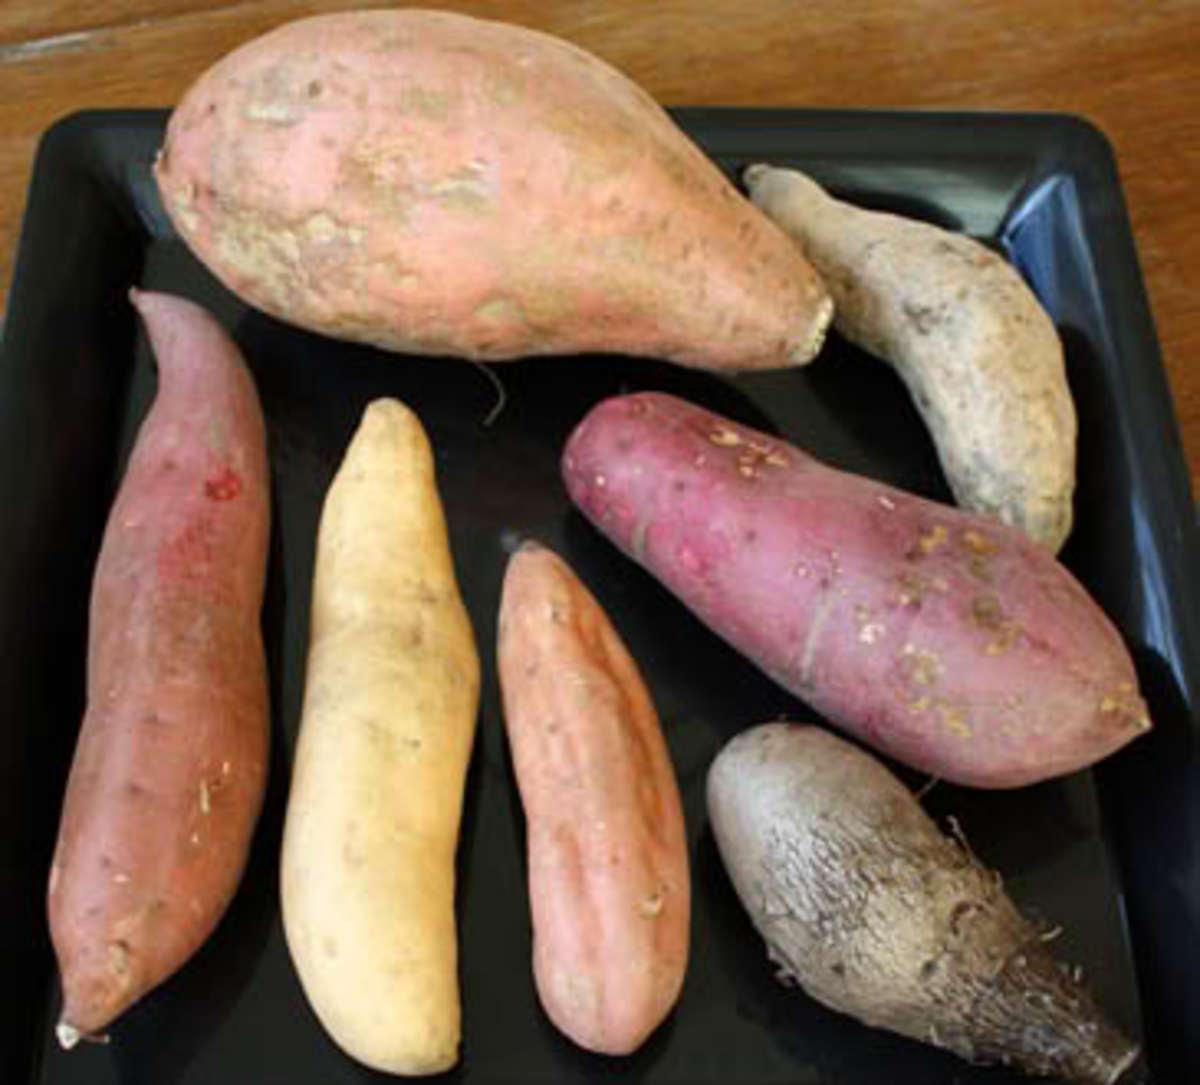 YAMS vs SWEET POTATOES - Yam and Sweet Potato Nutritional Comparison